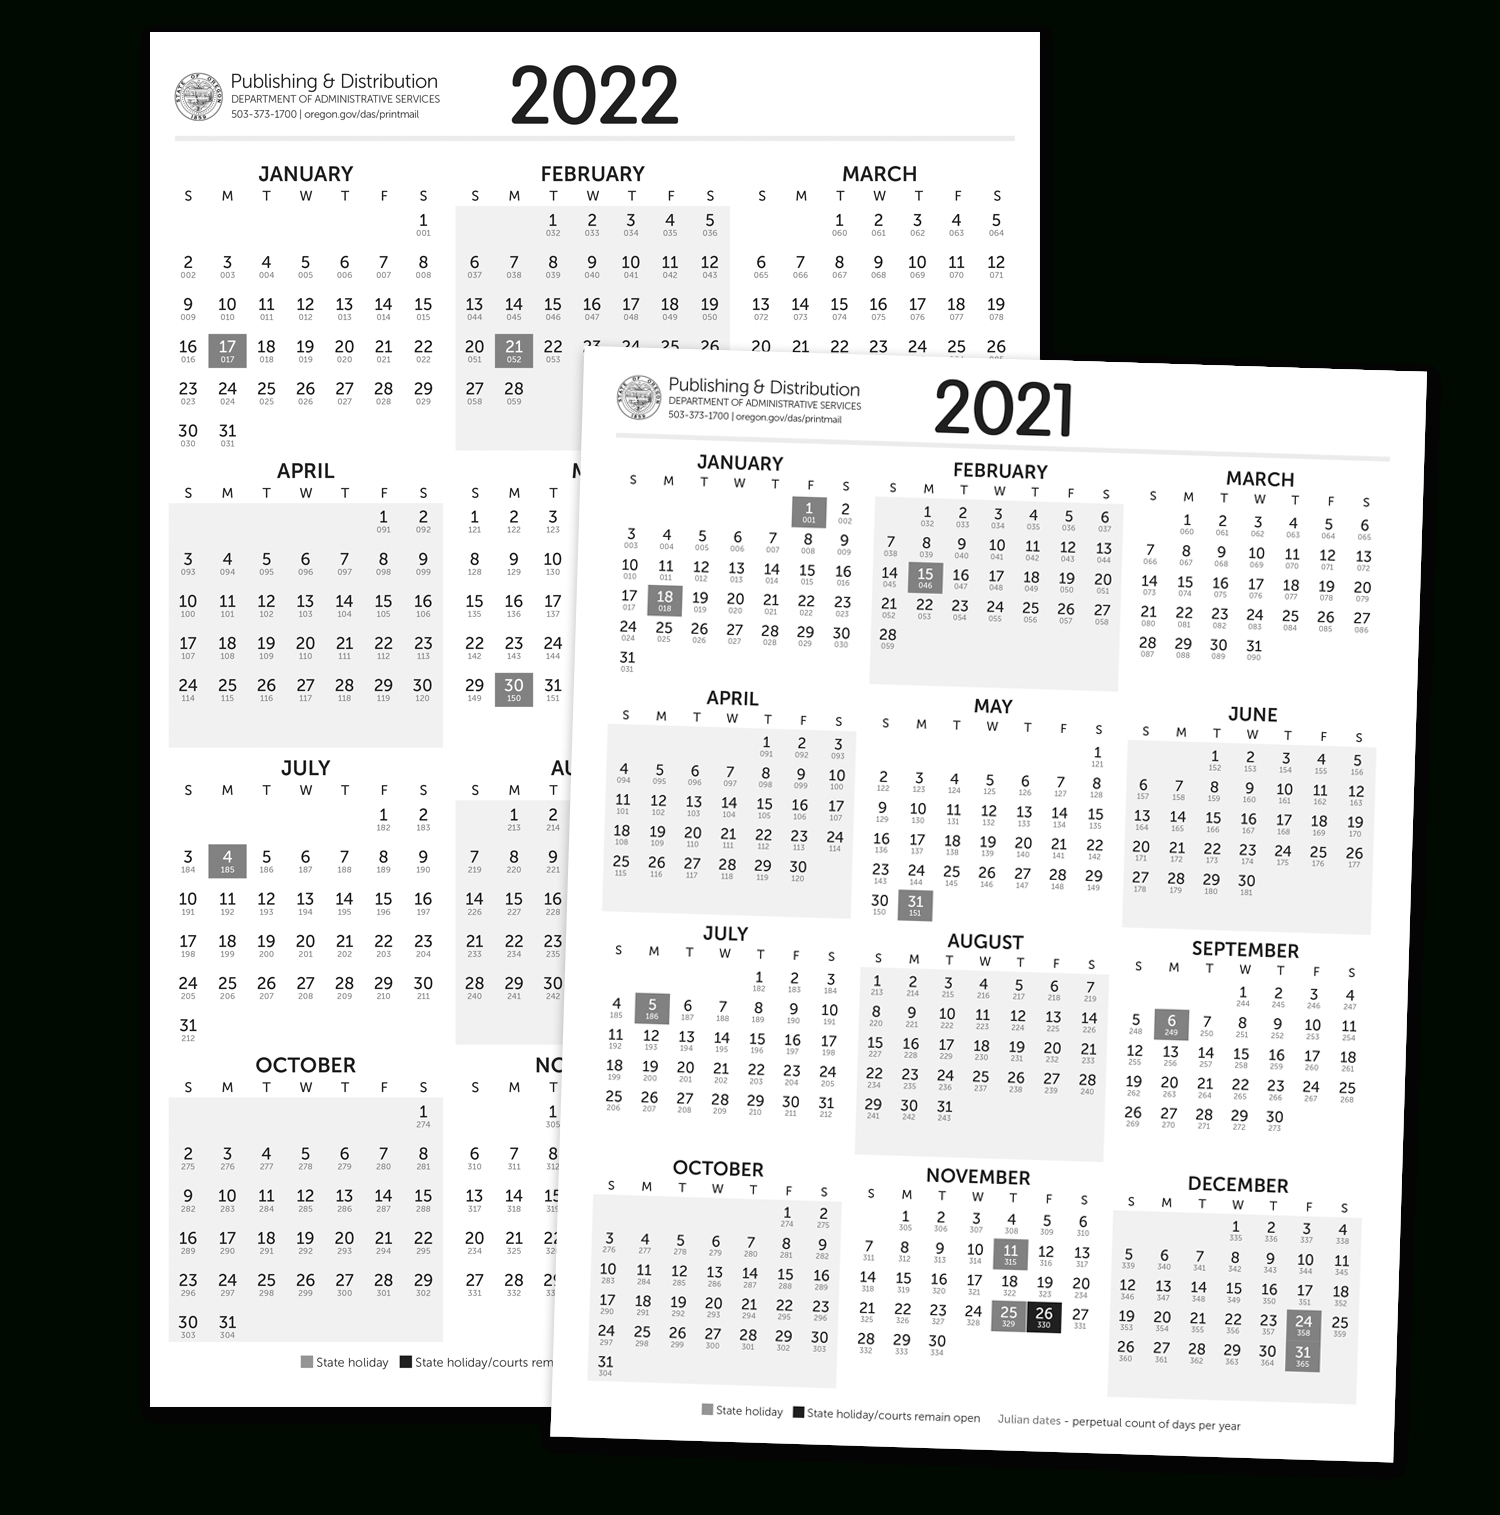 Julian Calendar For Leap Year 2021 | Printable Calendar-Julian Dates 2021